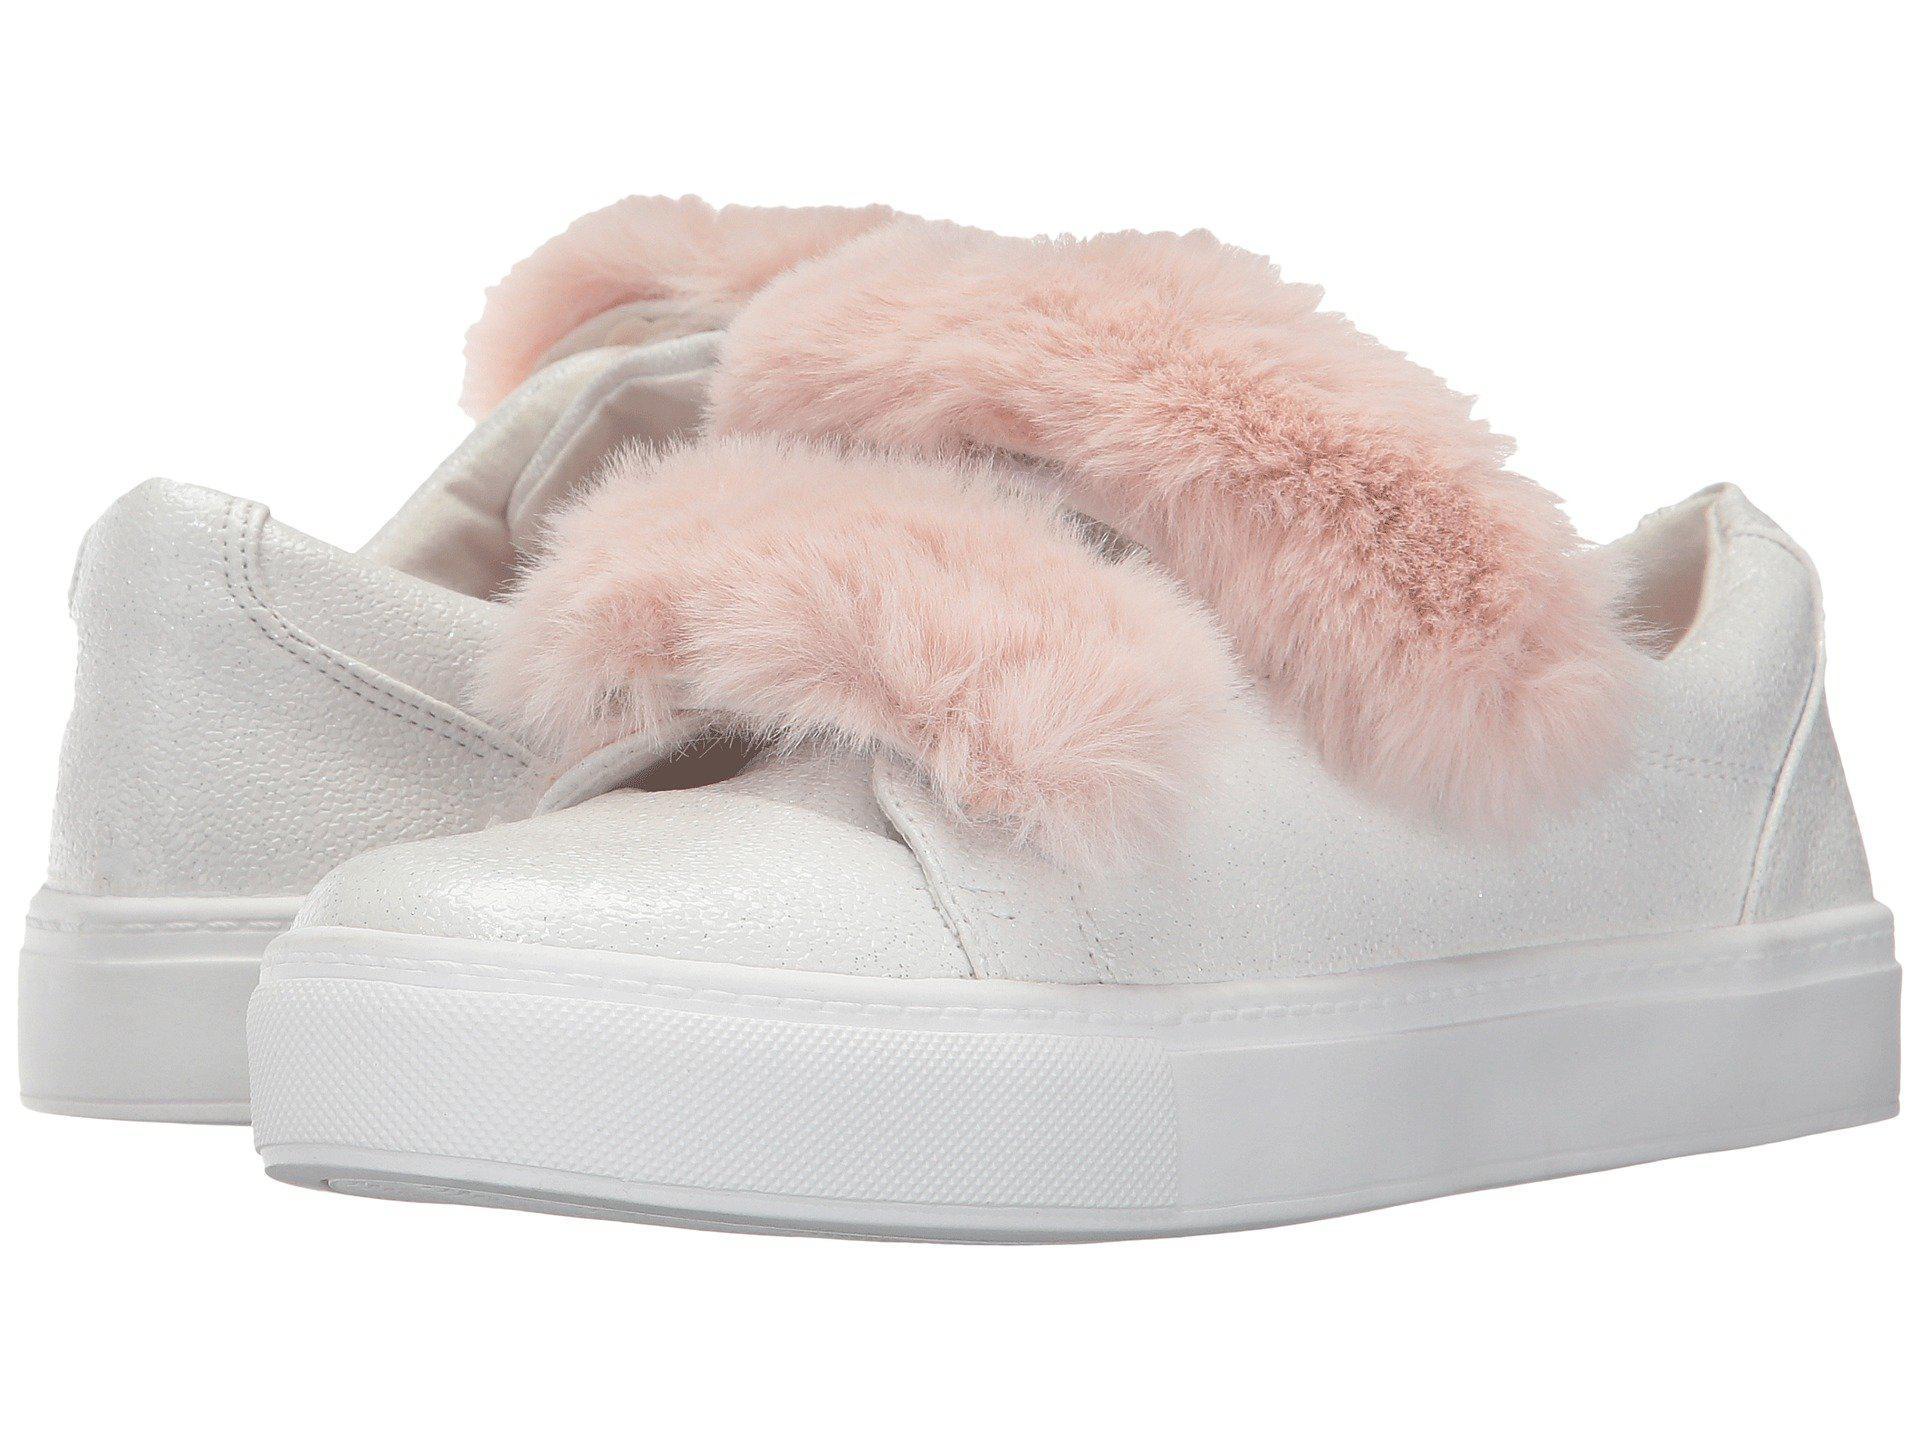 01d672d84e7e41 Lyst - Dirty Laundry Jordan Sneaker in White - Save 11%